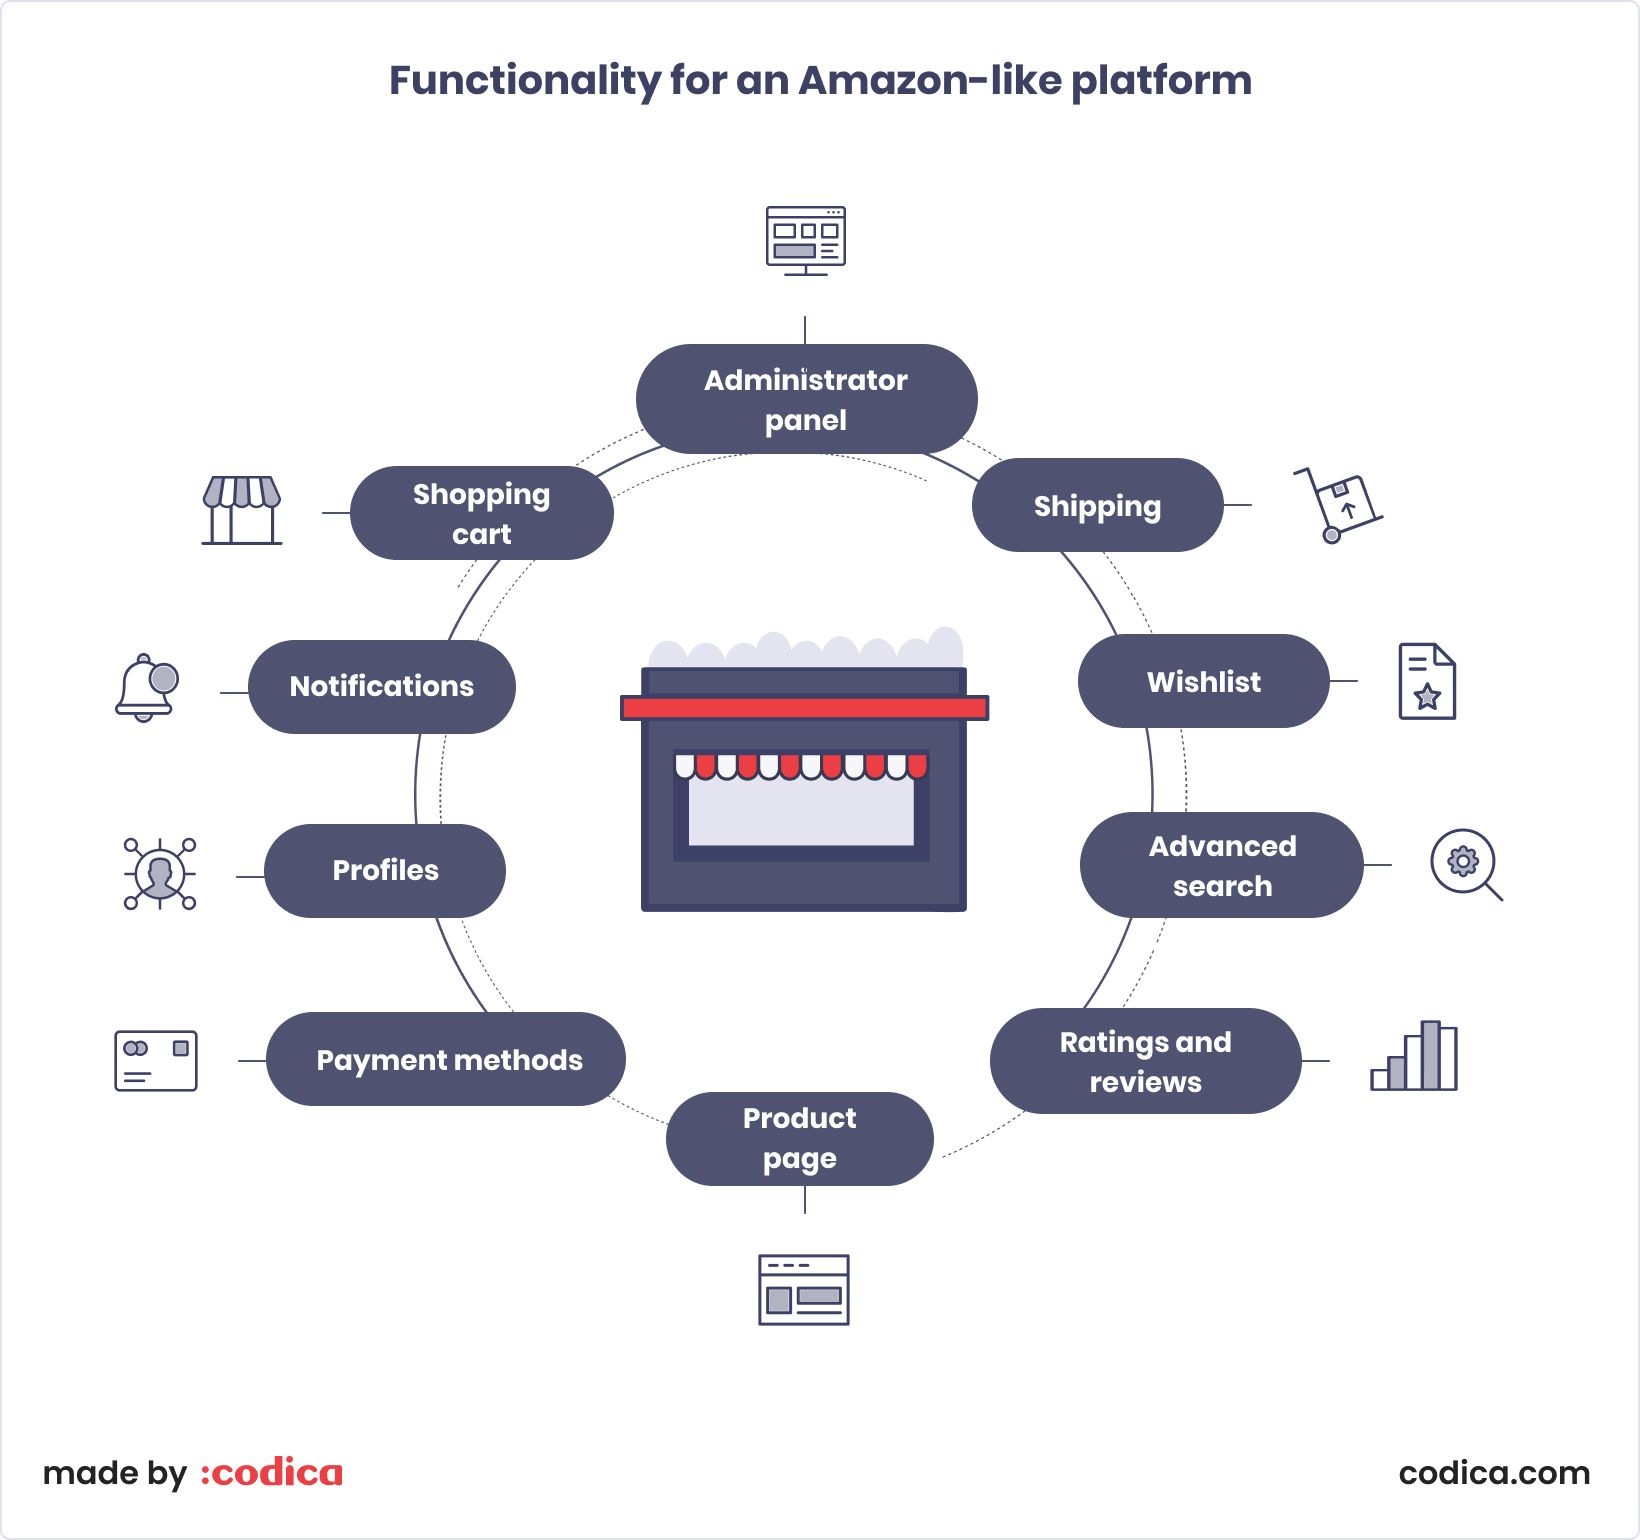 Functionality for an Amazon-like platform | Codica